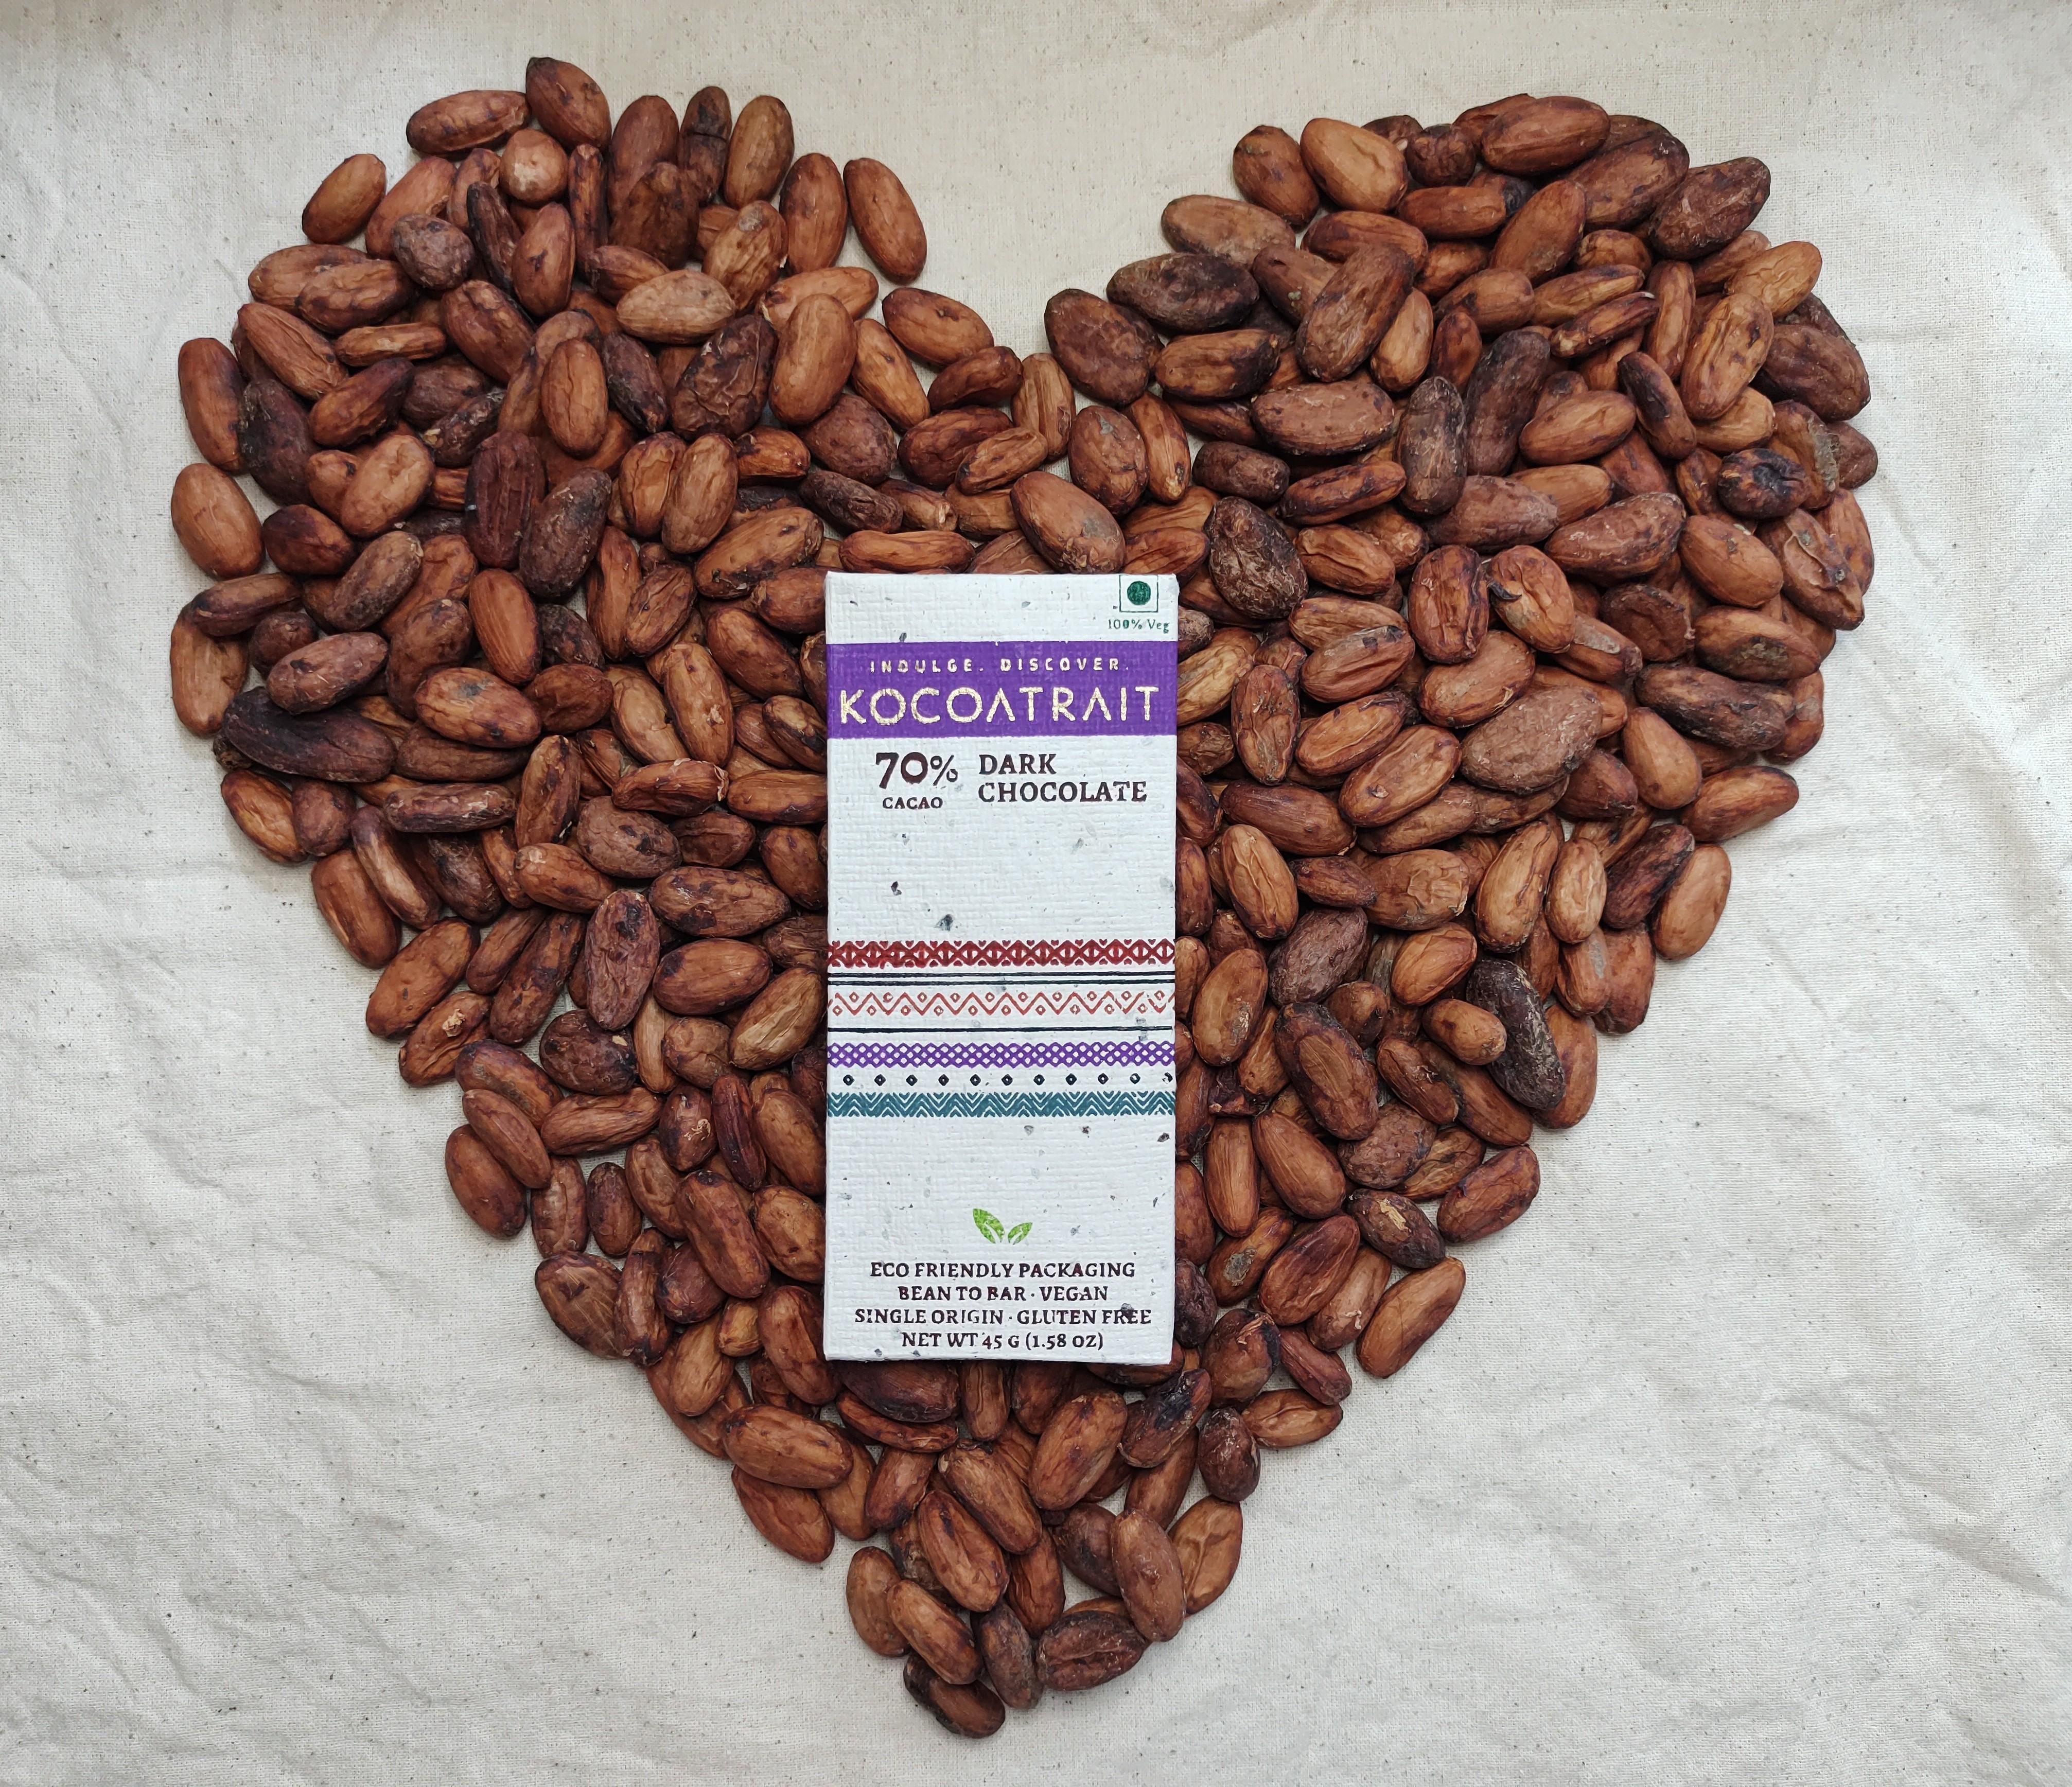 Kocoatrait Healthy Heart Dark Chocolate